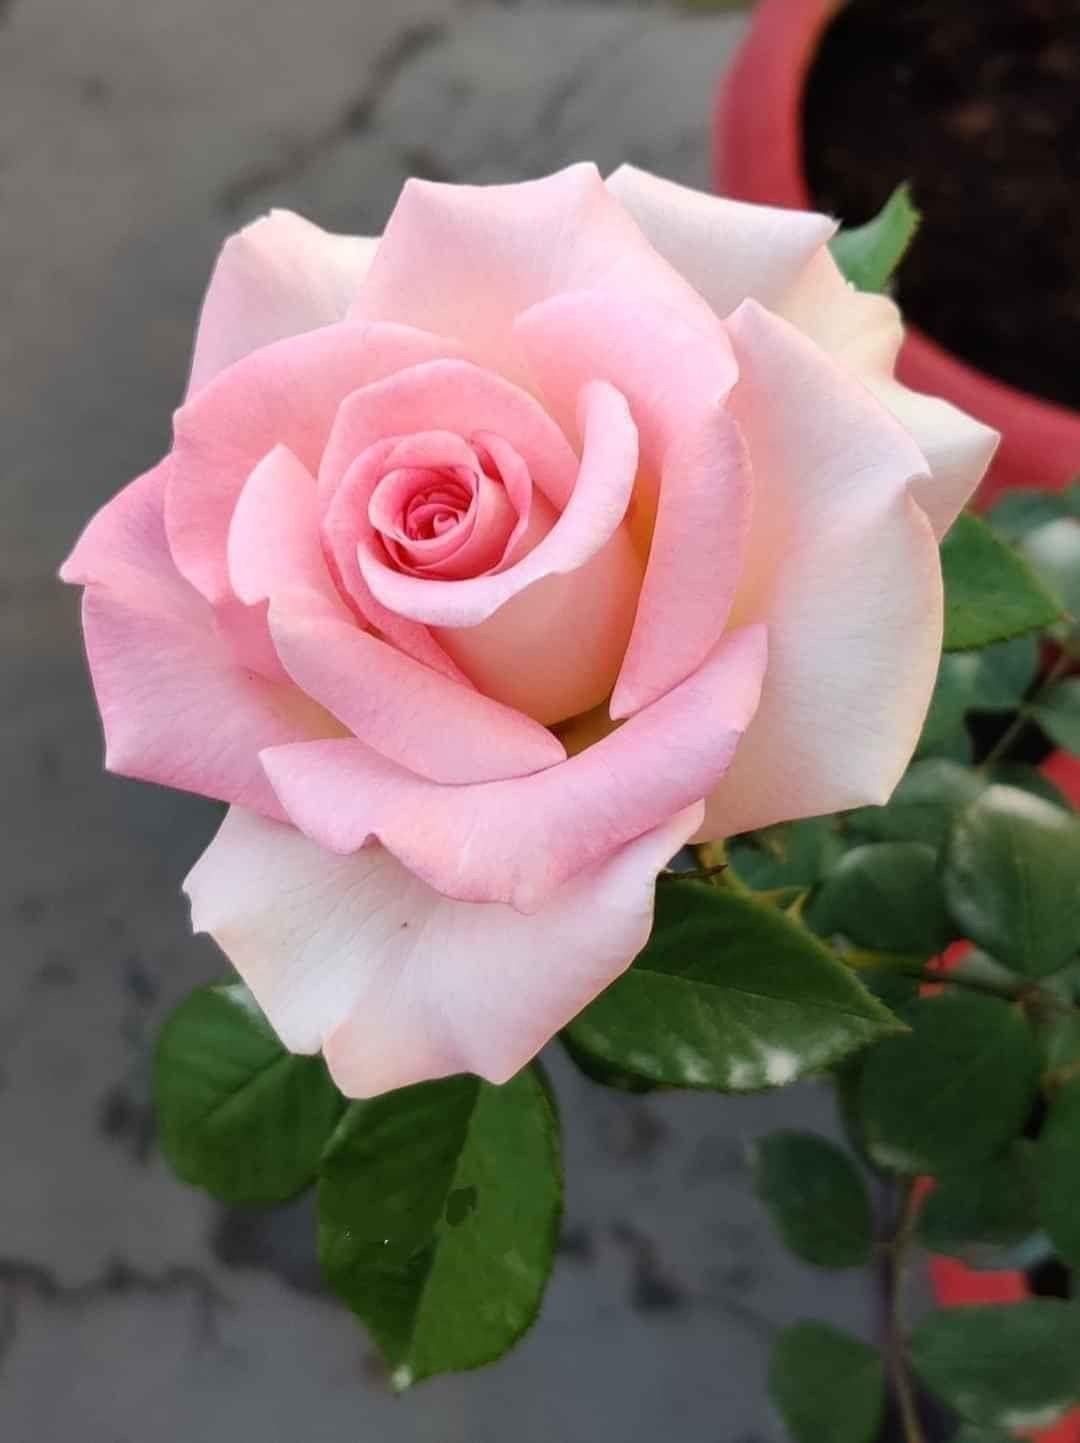 Pin By Volodymyr Nogas On Kviti In 2020 Pansies Flowers Flower Garden Design Rose Flower